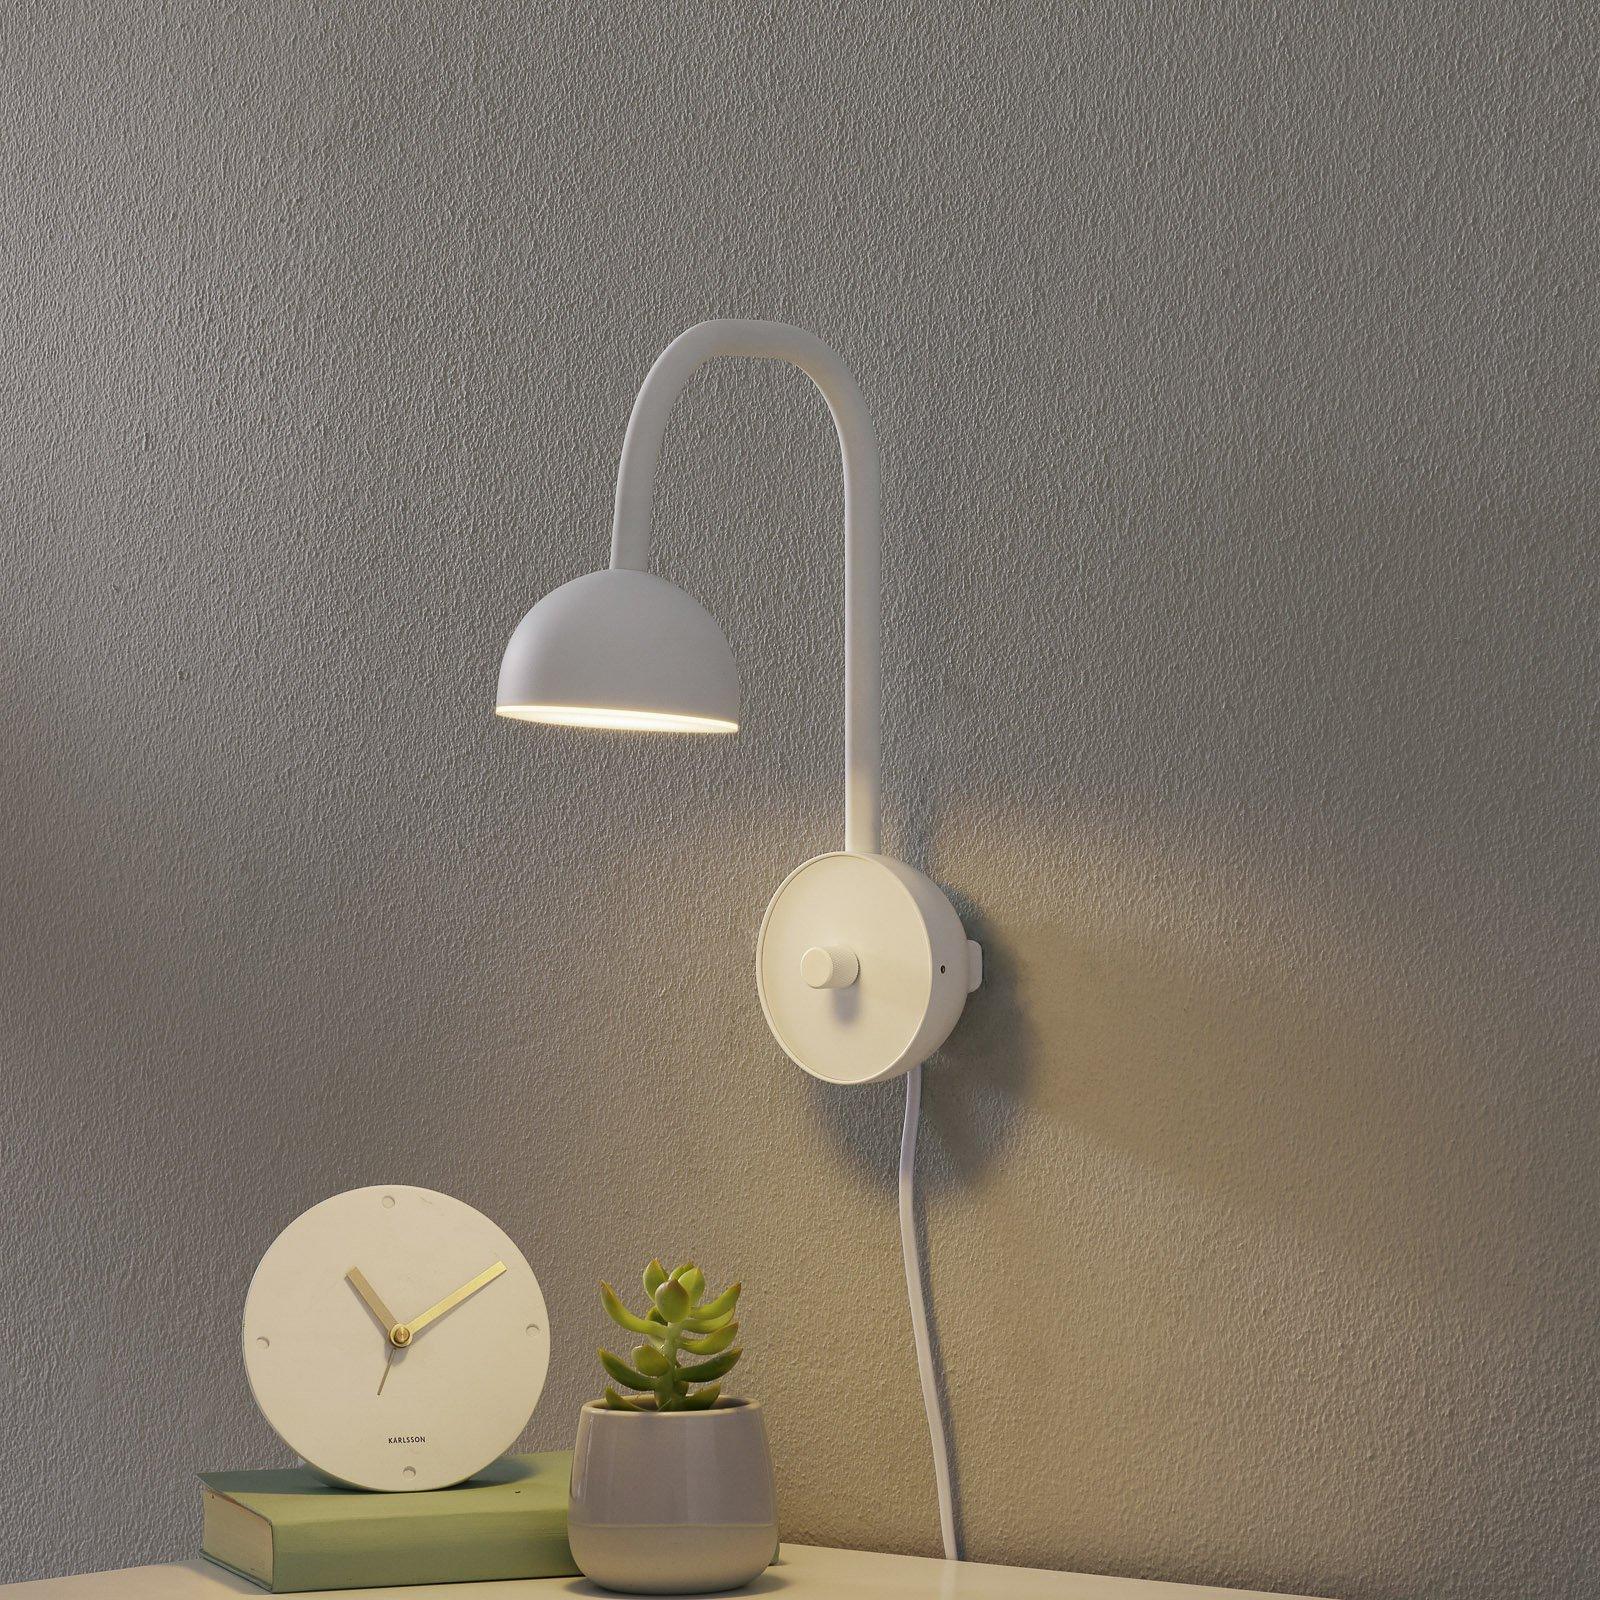 Northern Blush LED-vegglampe, hvit